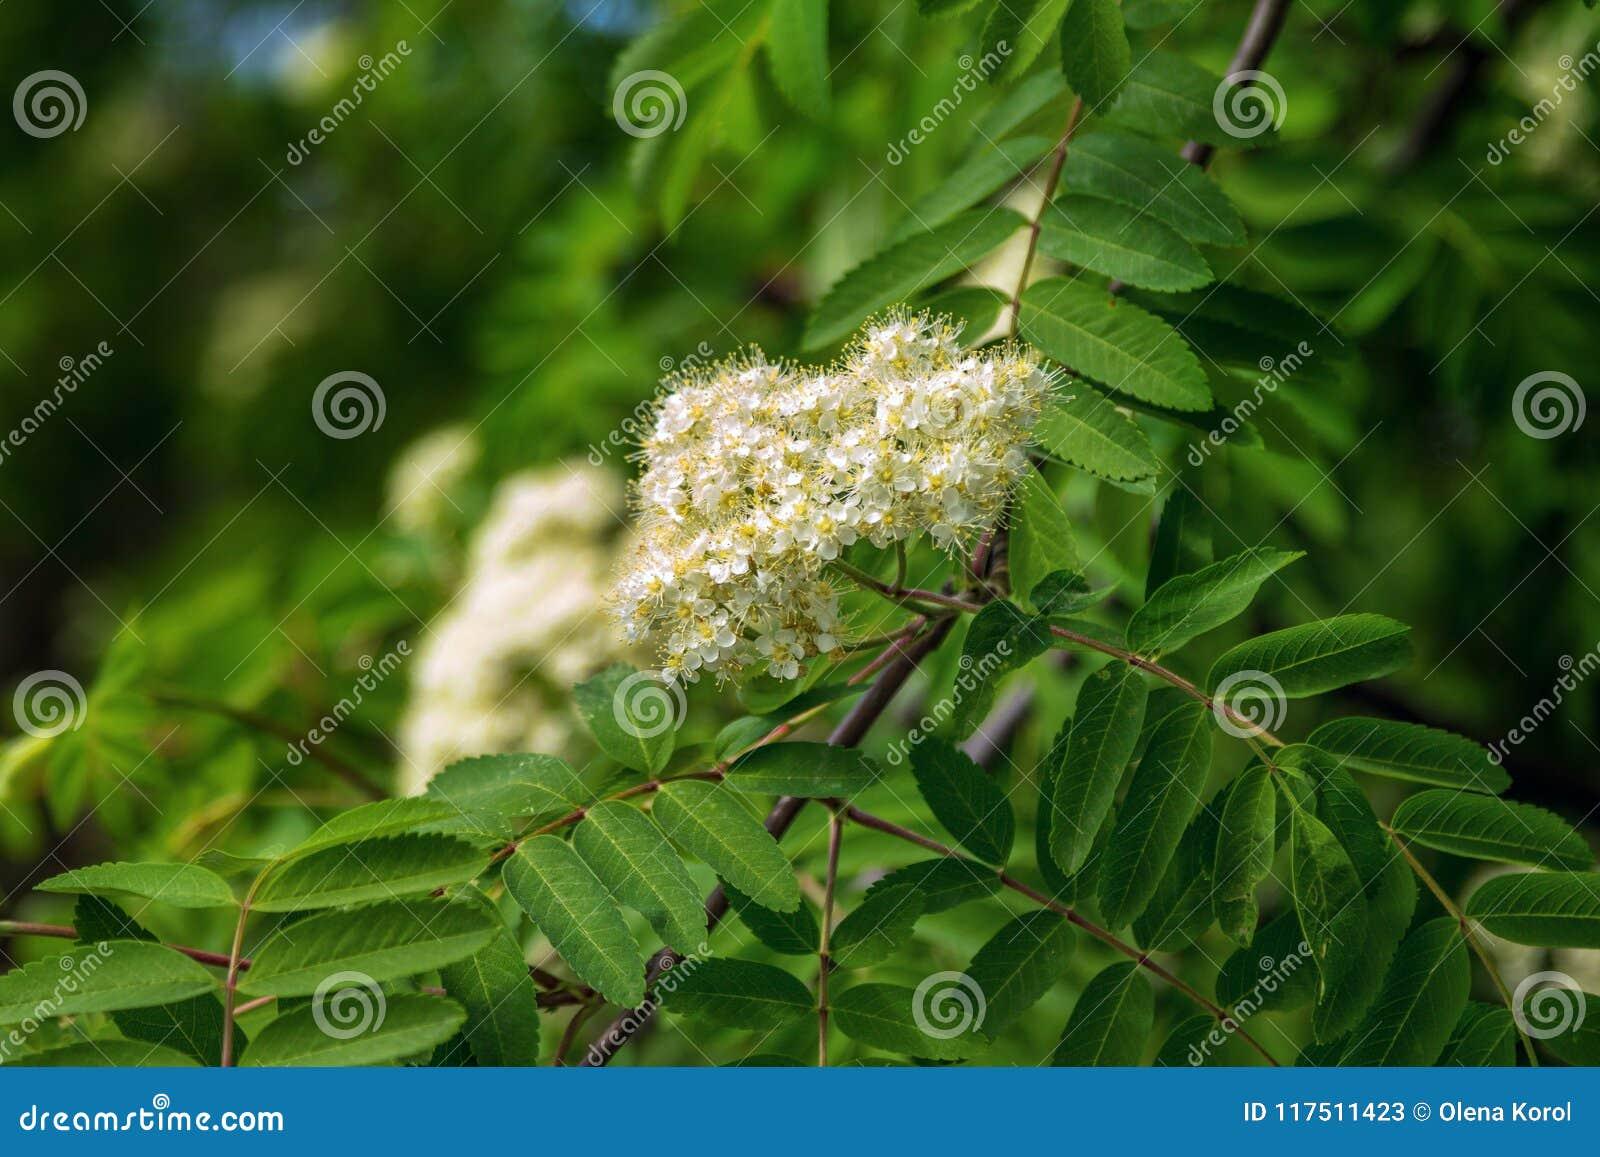 Beautiful Blooming Rowan Tree Branch Stock Image Image Of Blooming